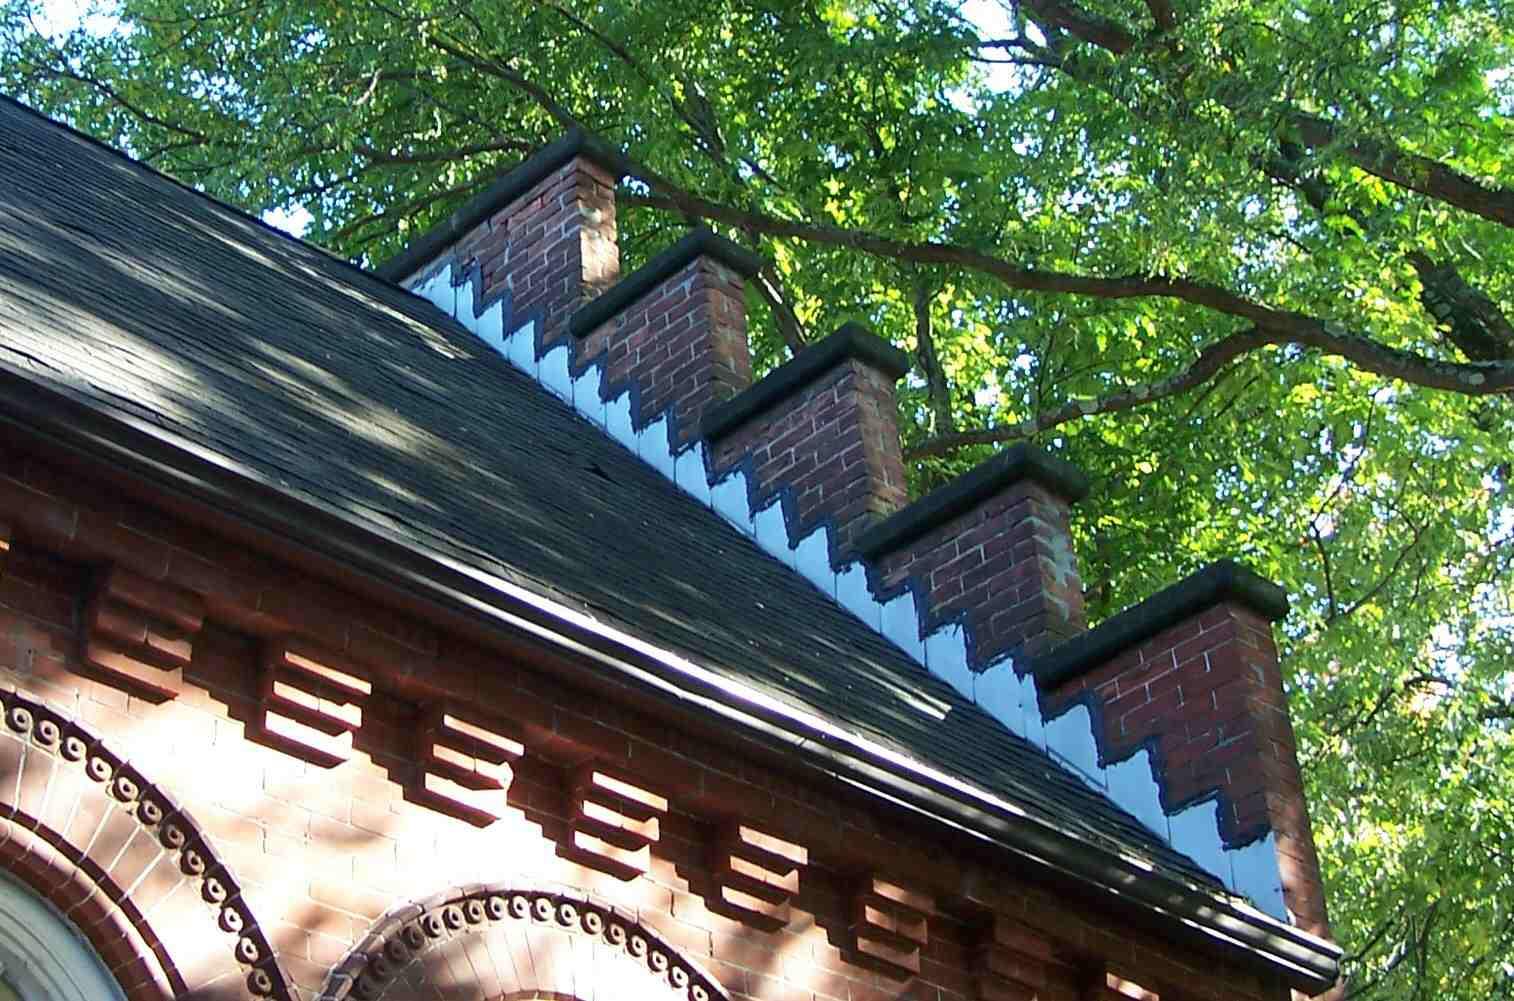 metal flashing along the parapet of a Stockbridge, Massachusetts brick building